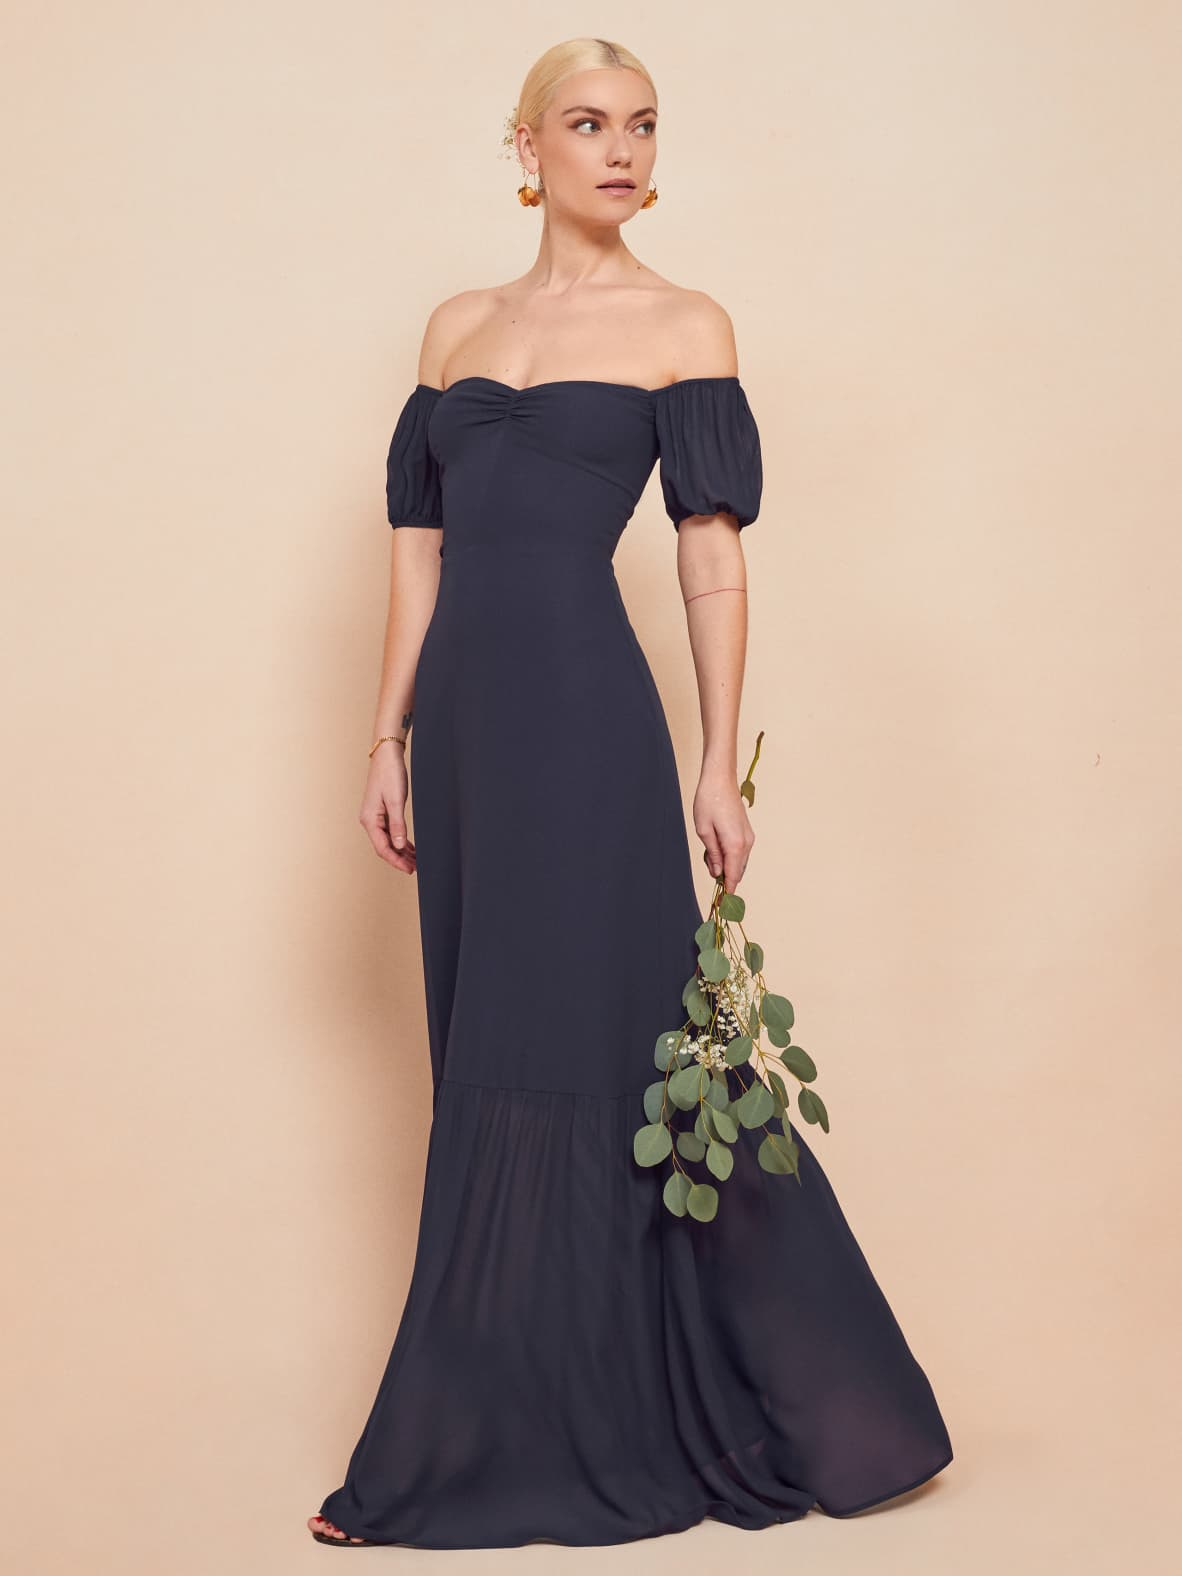 reformation navy long farrow dress